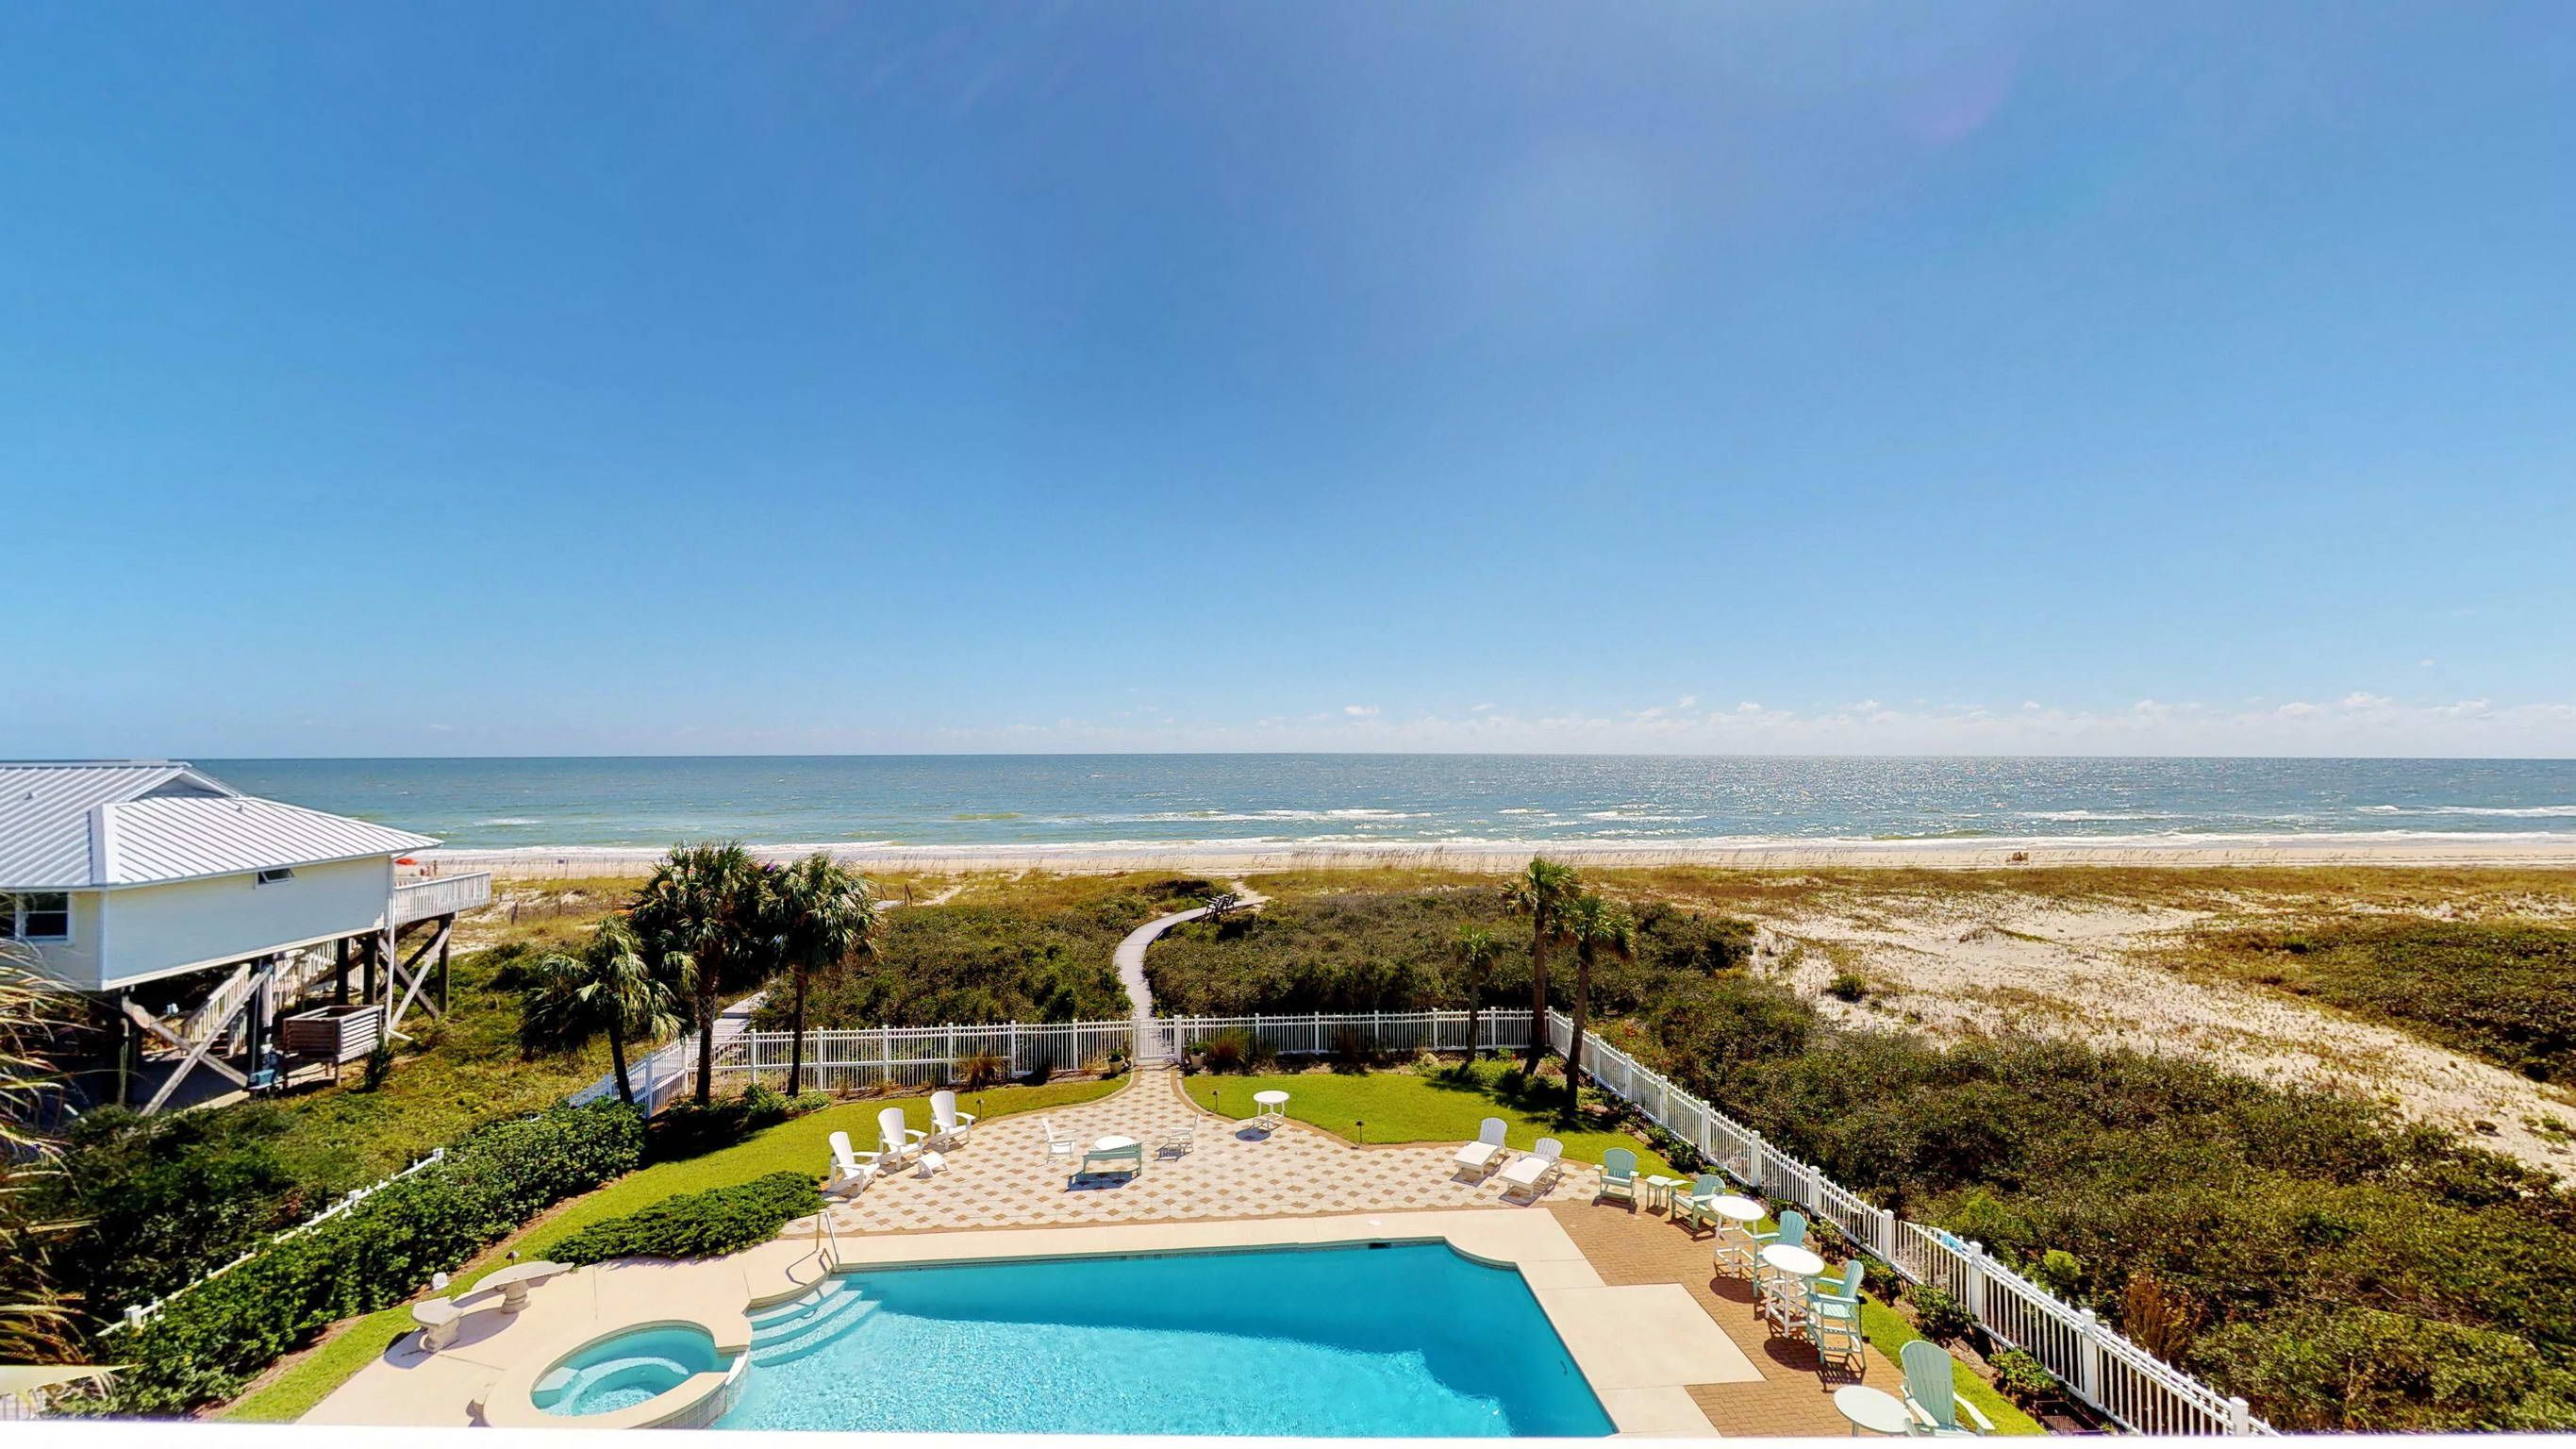 Aisle of palms beachfront swimming pool pet friendly